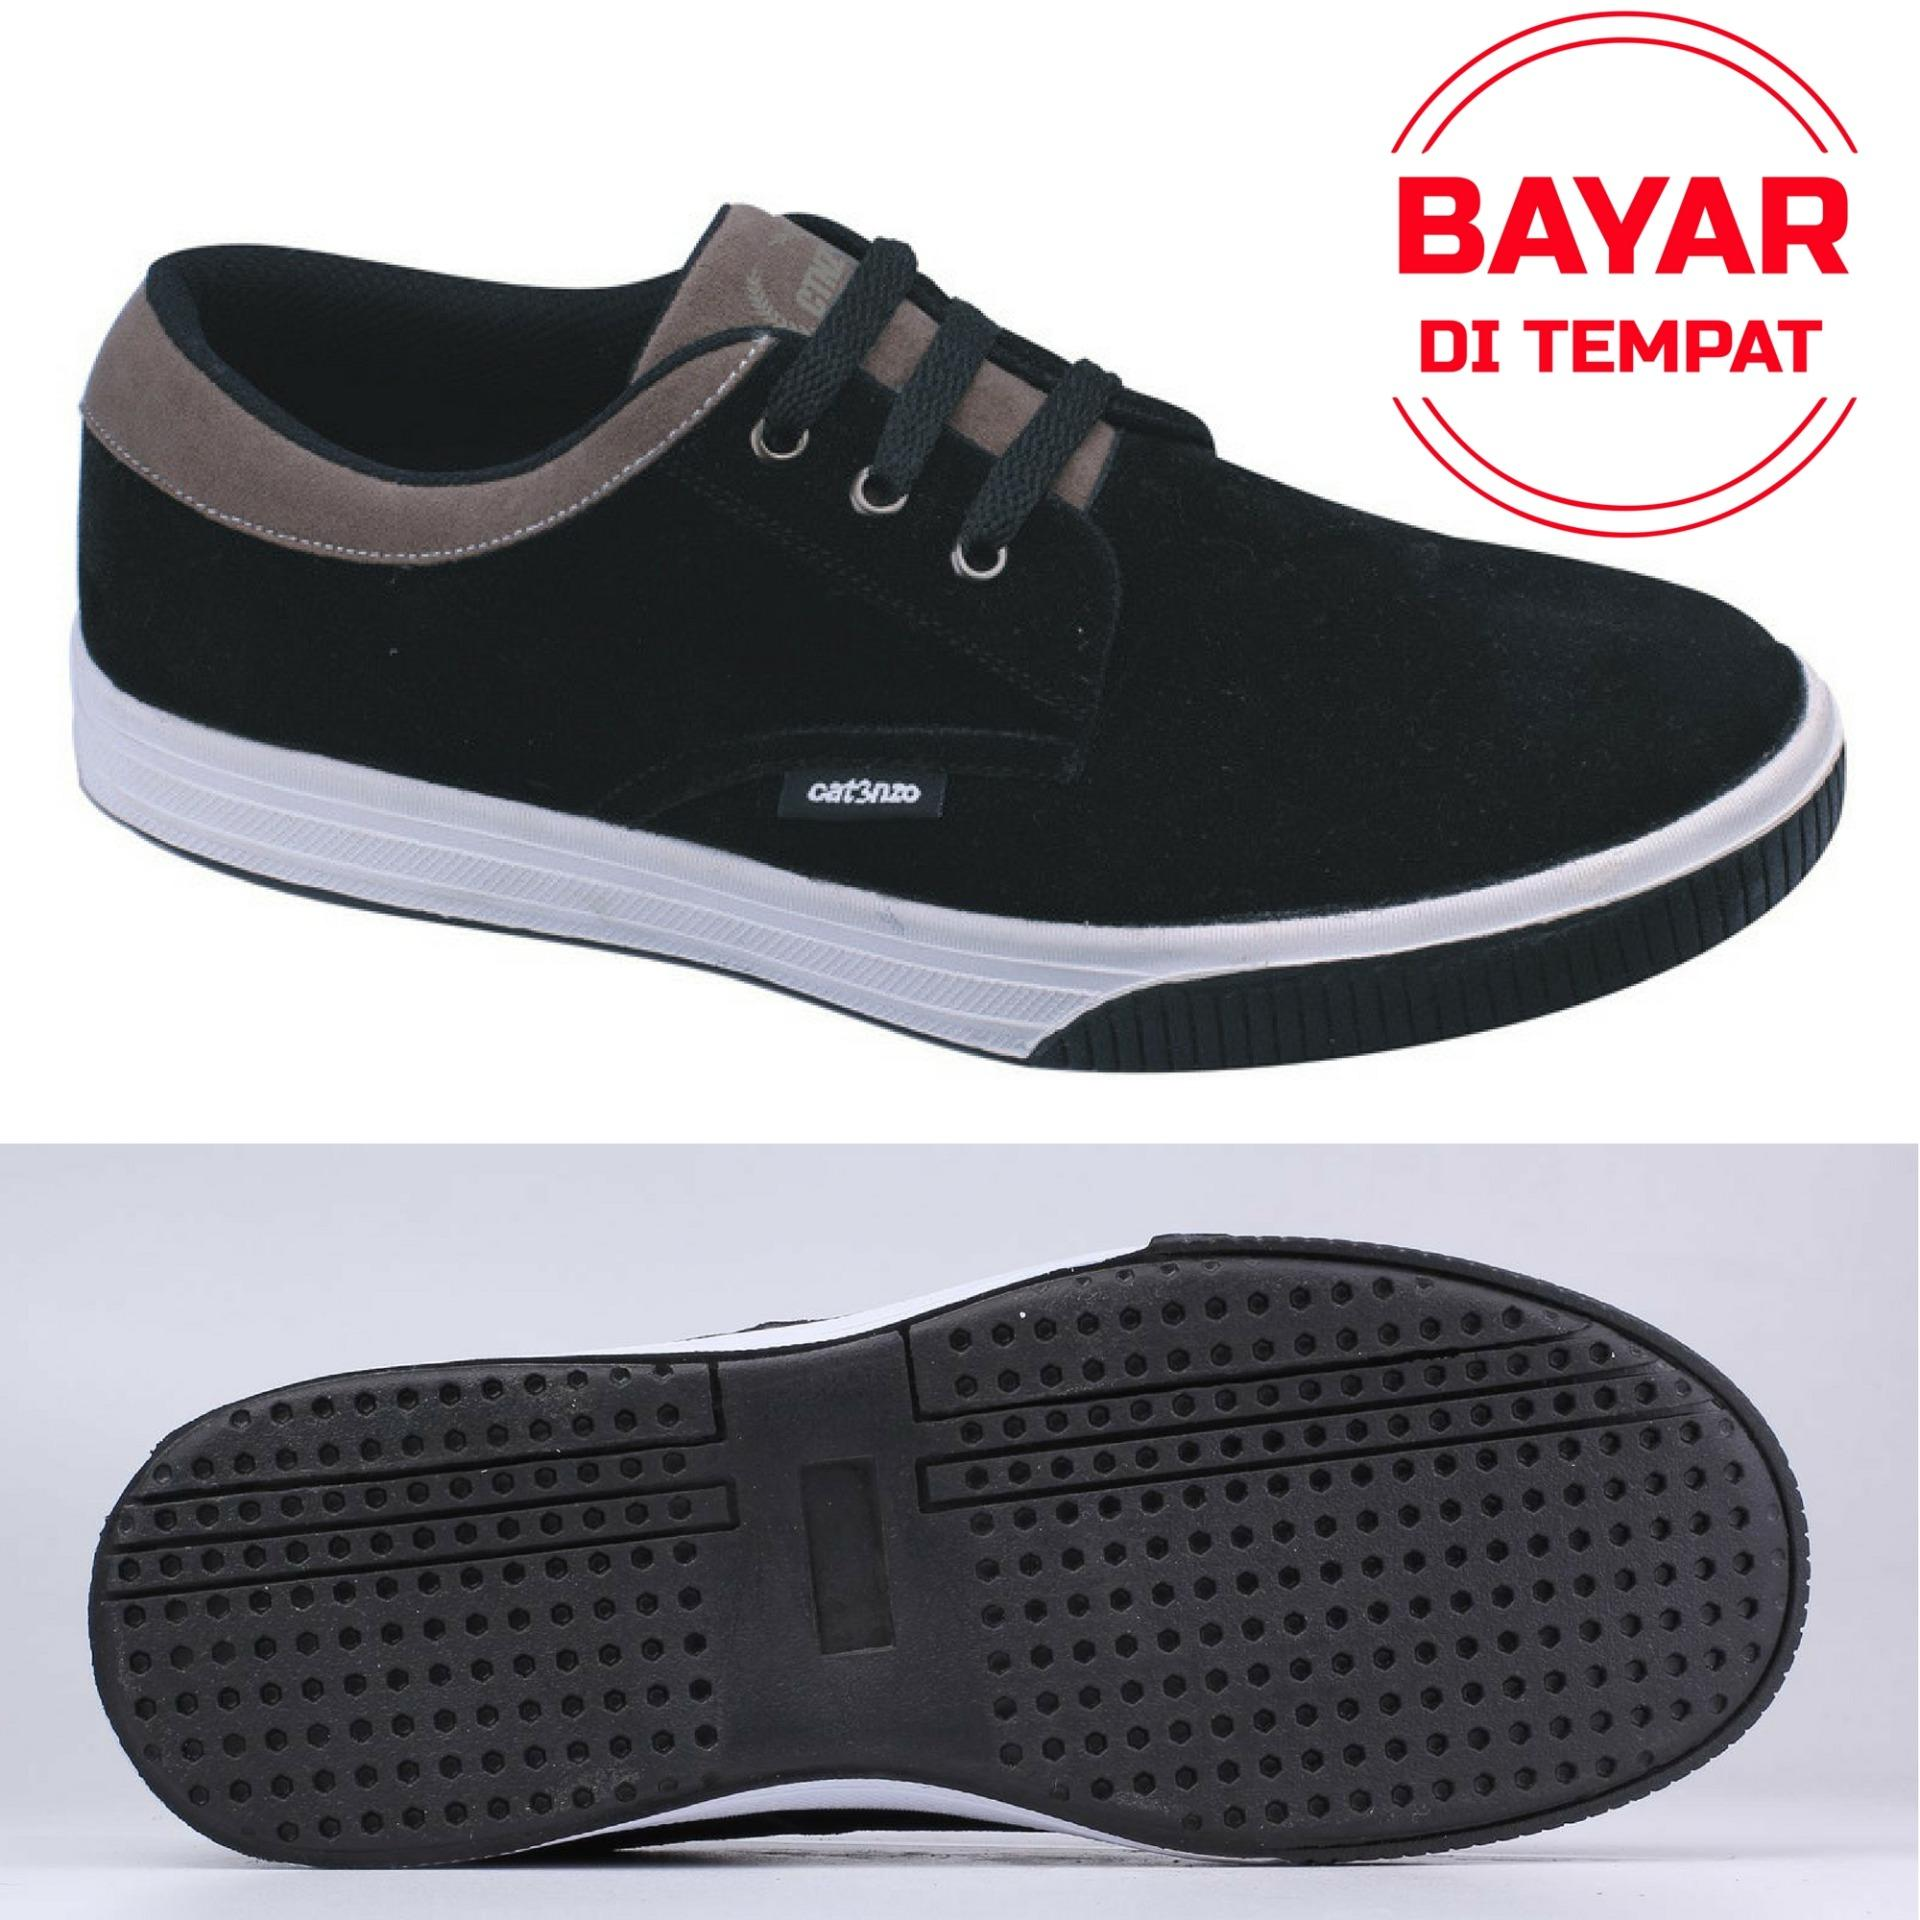 Fitur Sepatu Kasual Sporty Hitam Catenzo Tf 105 656 Dan Harga ... 60ef6880c5